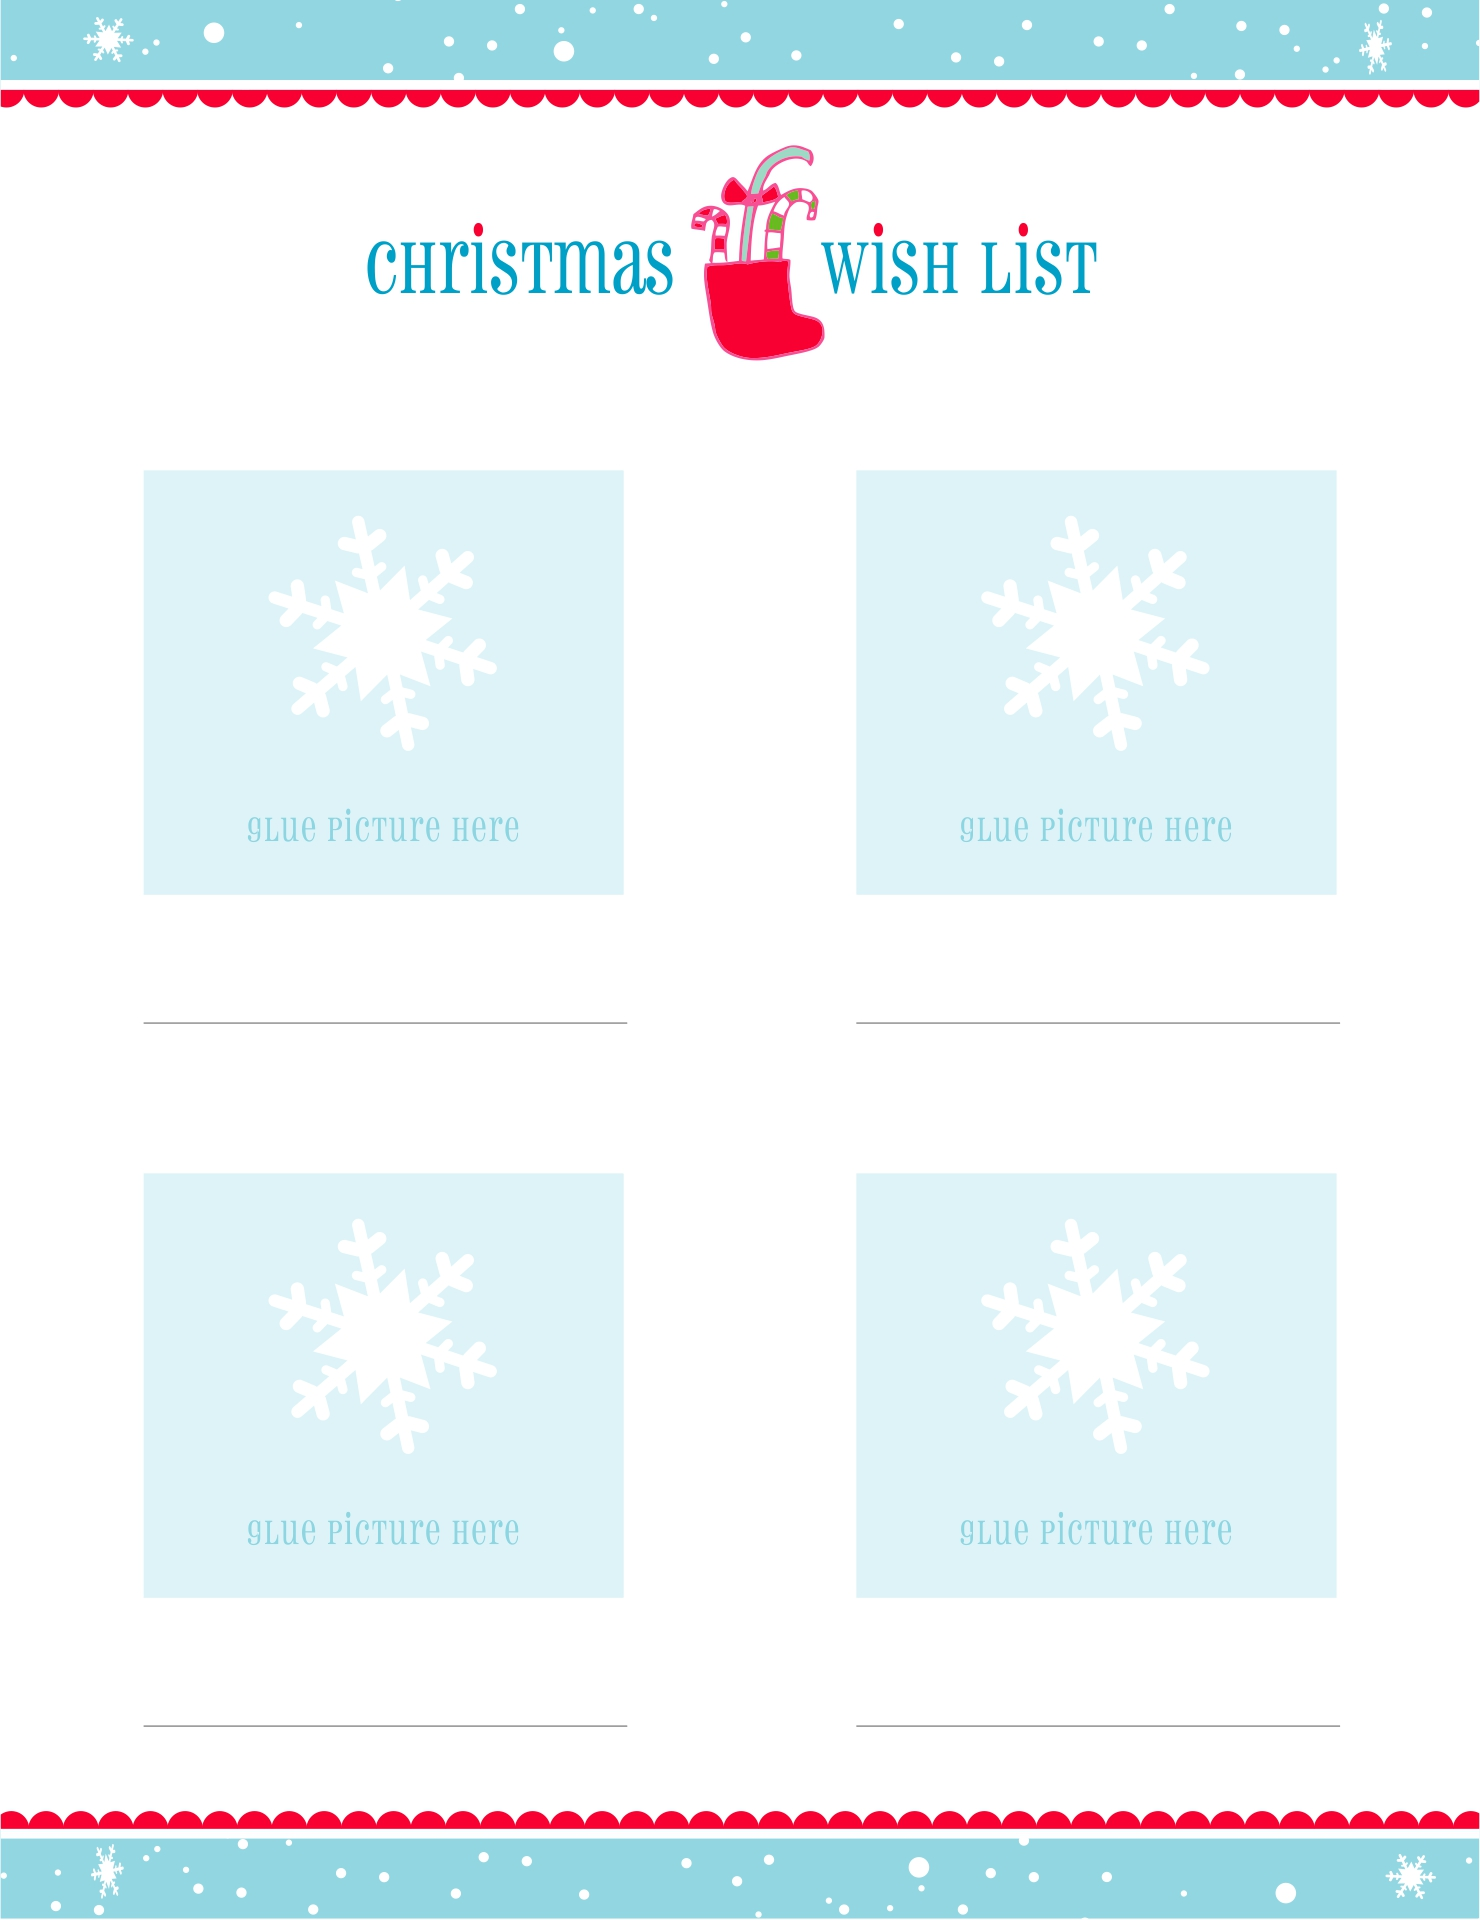 5 Images of Free Printable Christmas List Maker